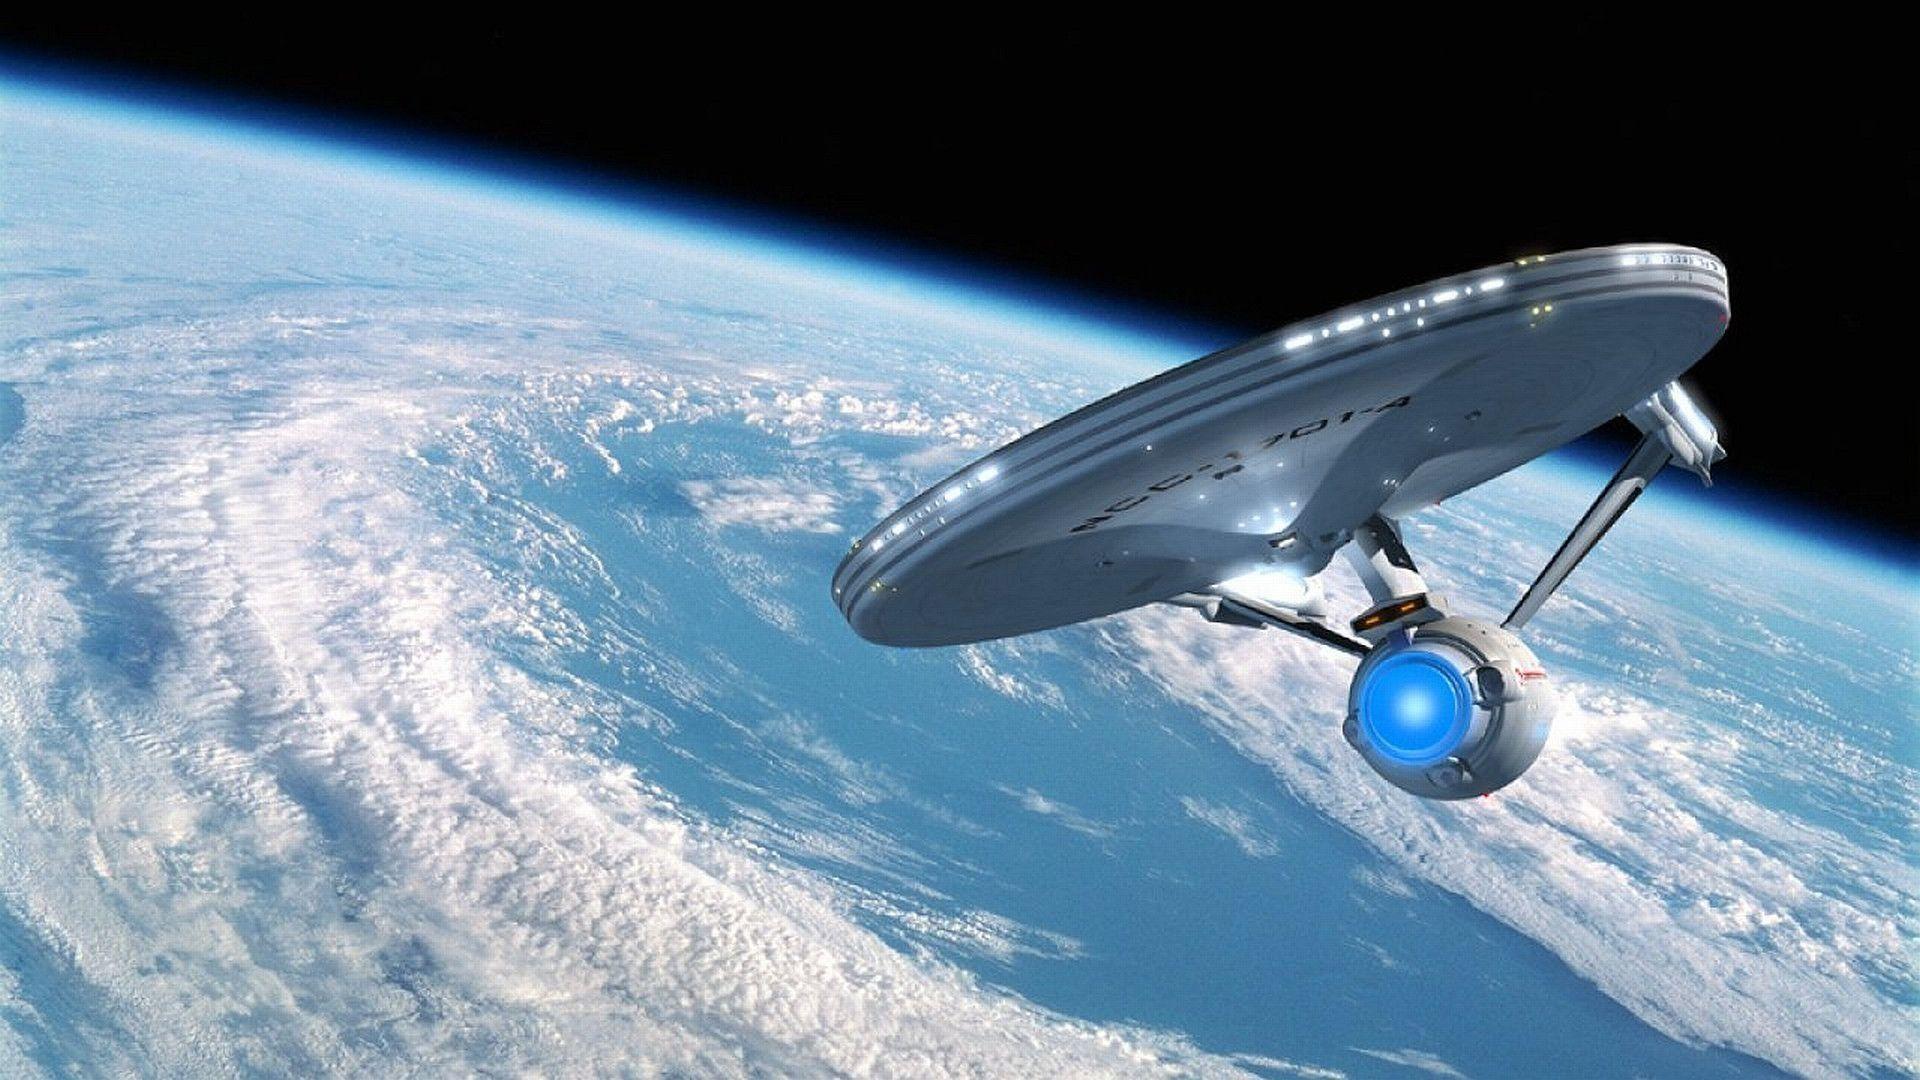 HD Star Trek Wallpaper 1